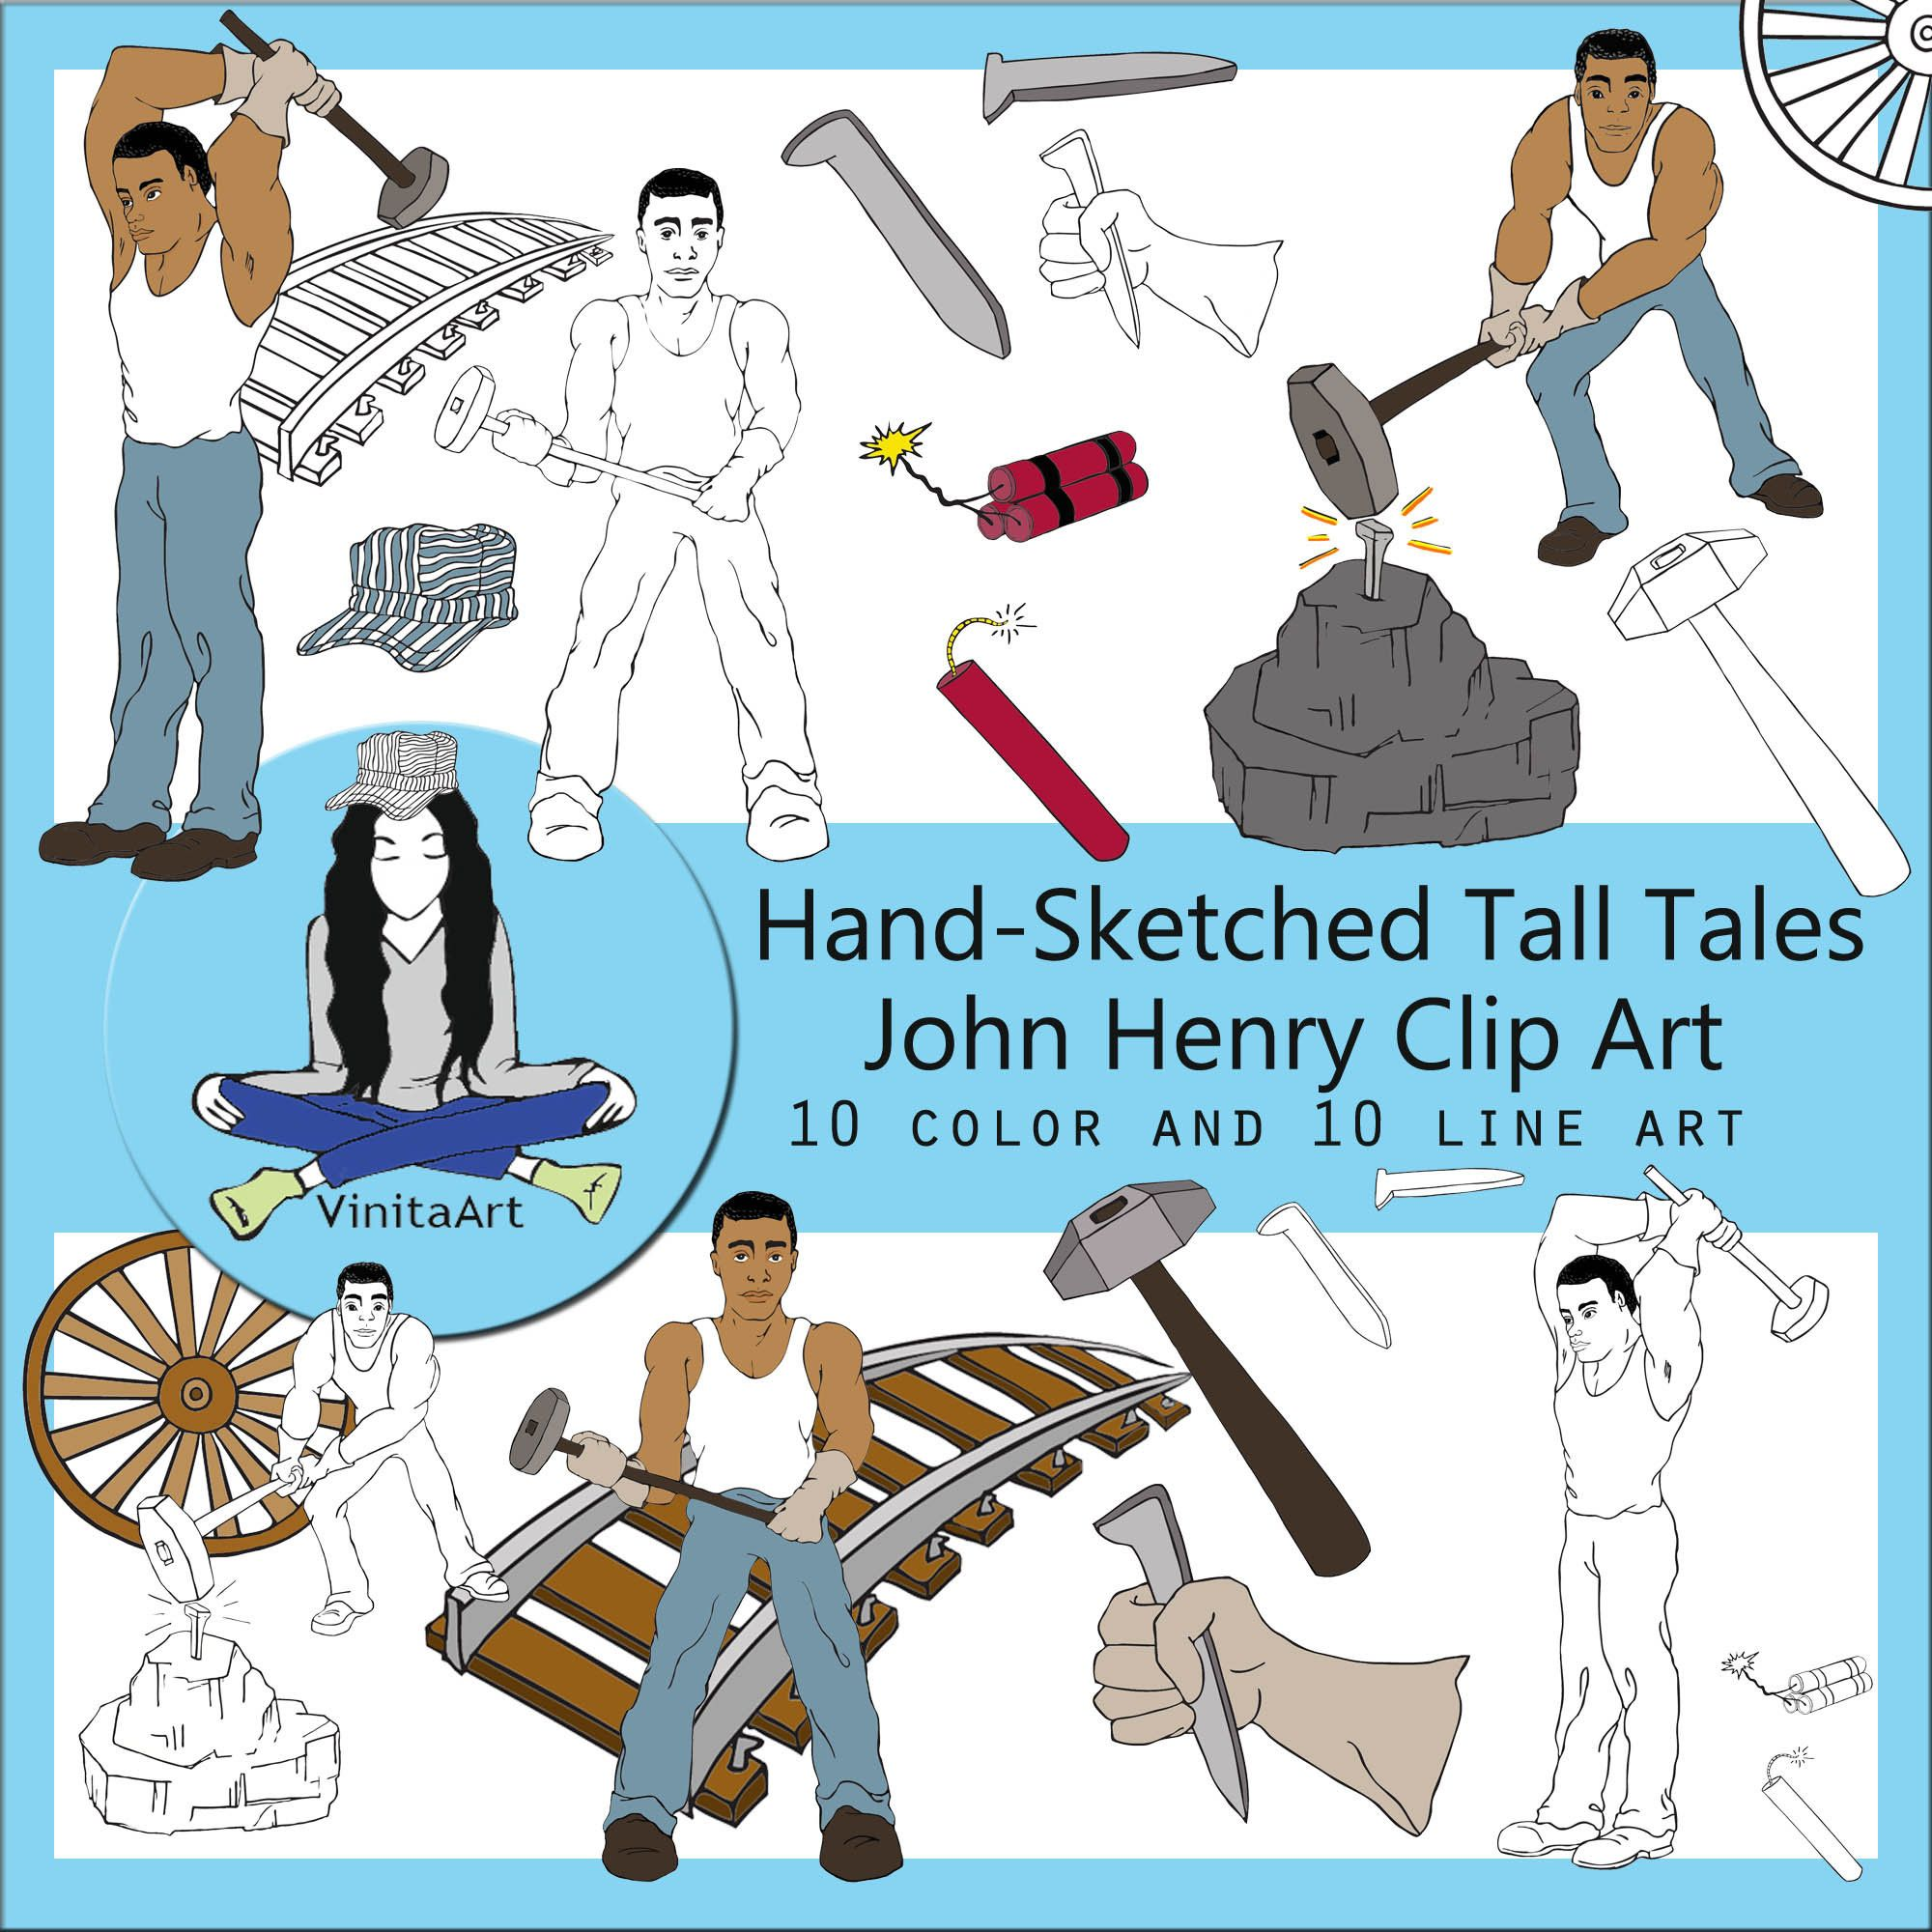 John Henry Clip Art Downloadable Tall Tales Home